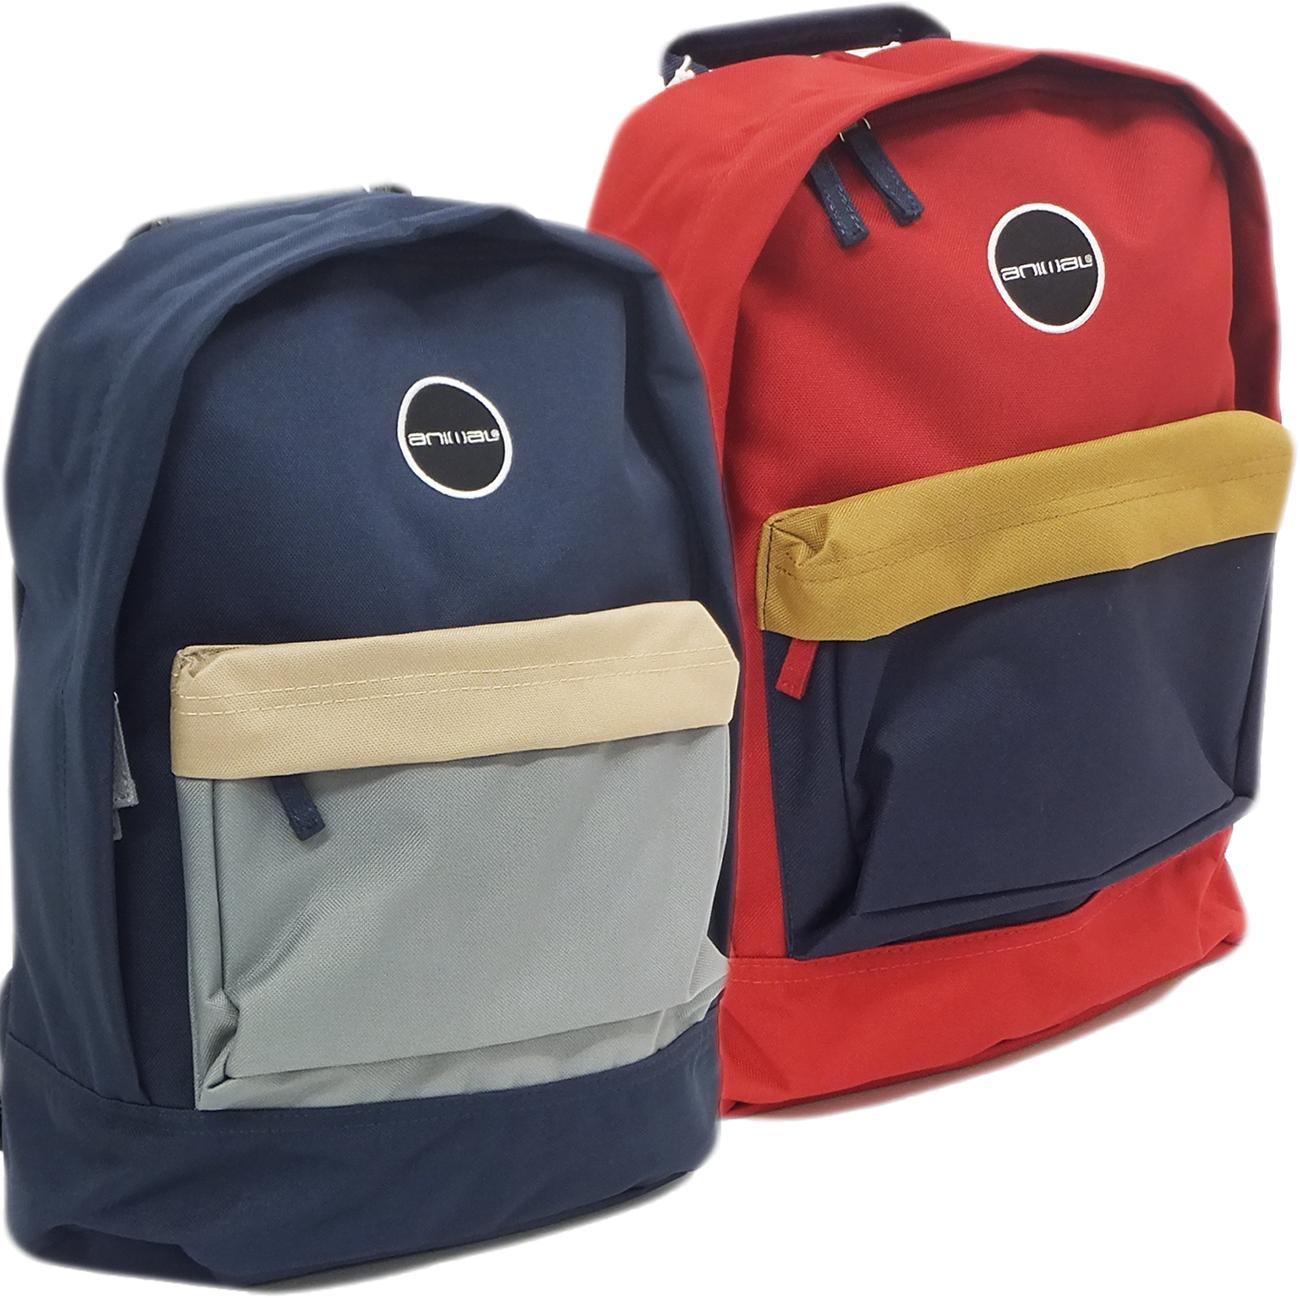 Gym Bag For Work: Mens Animal Rucksack Bag / School